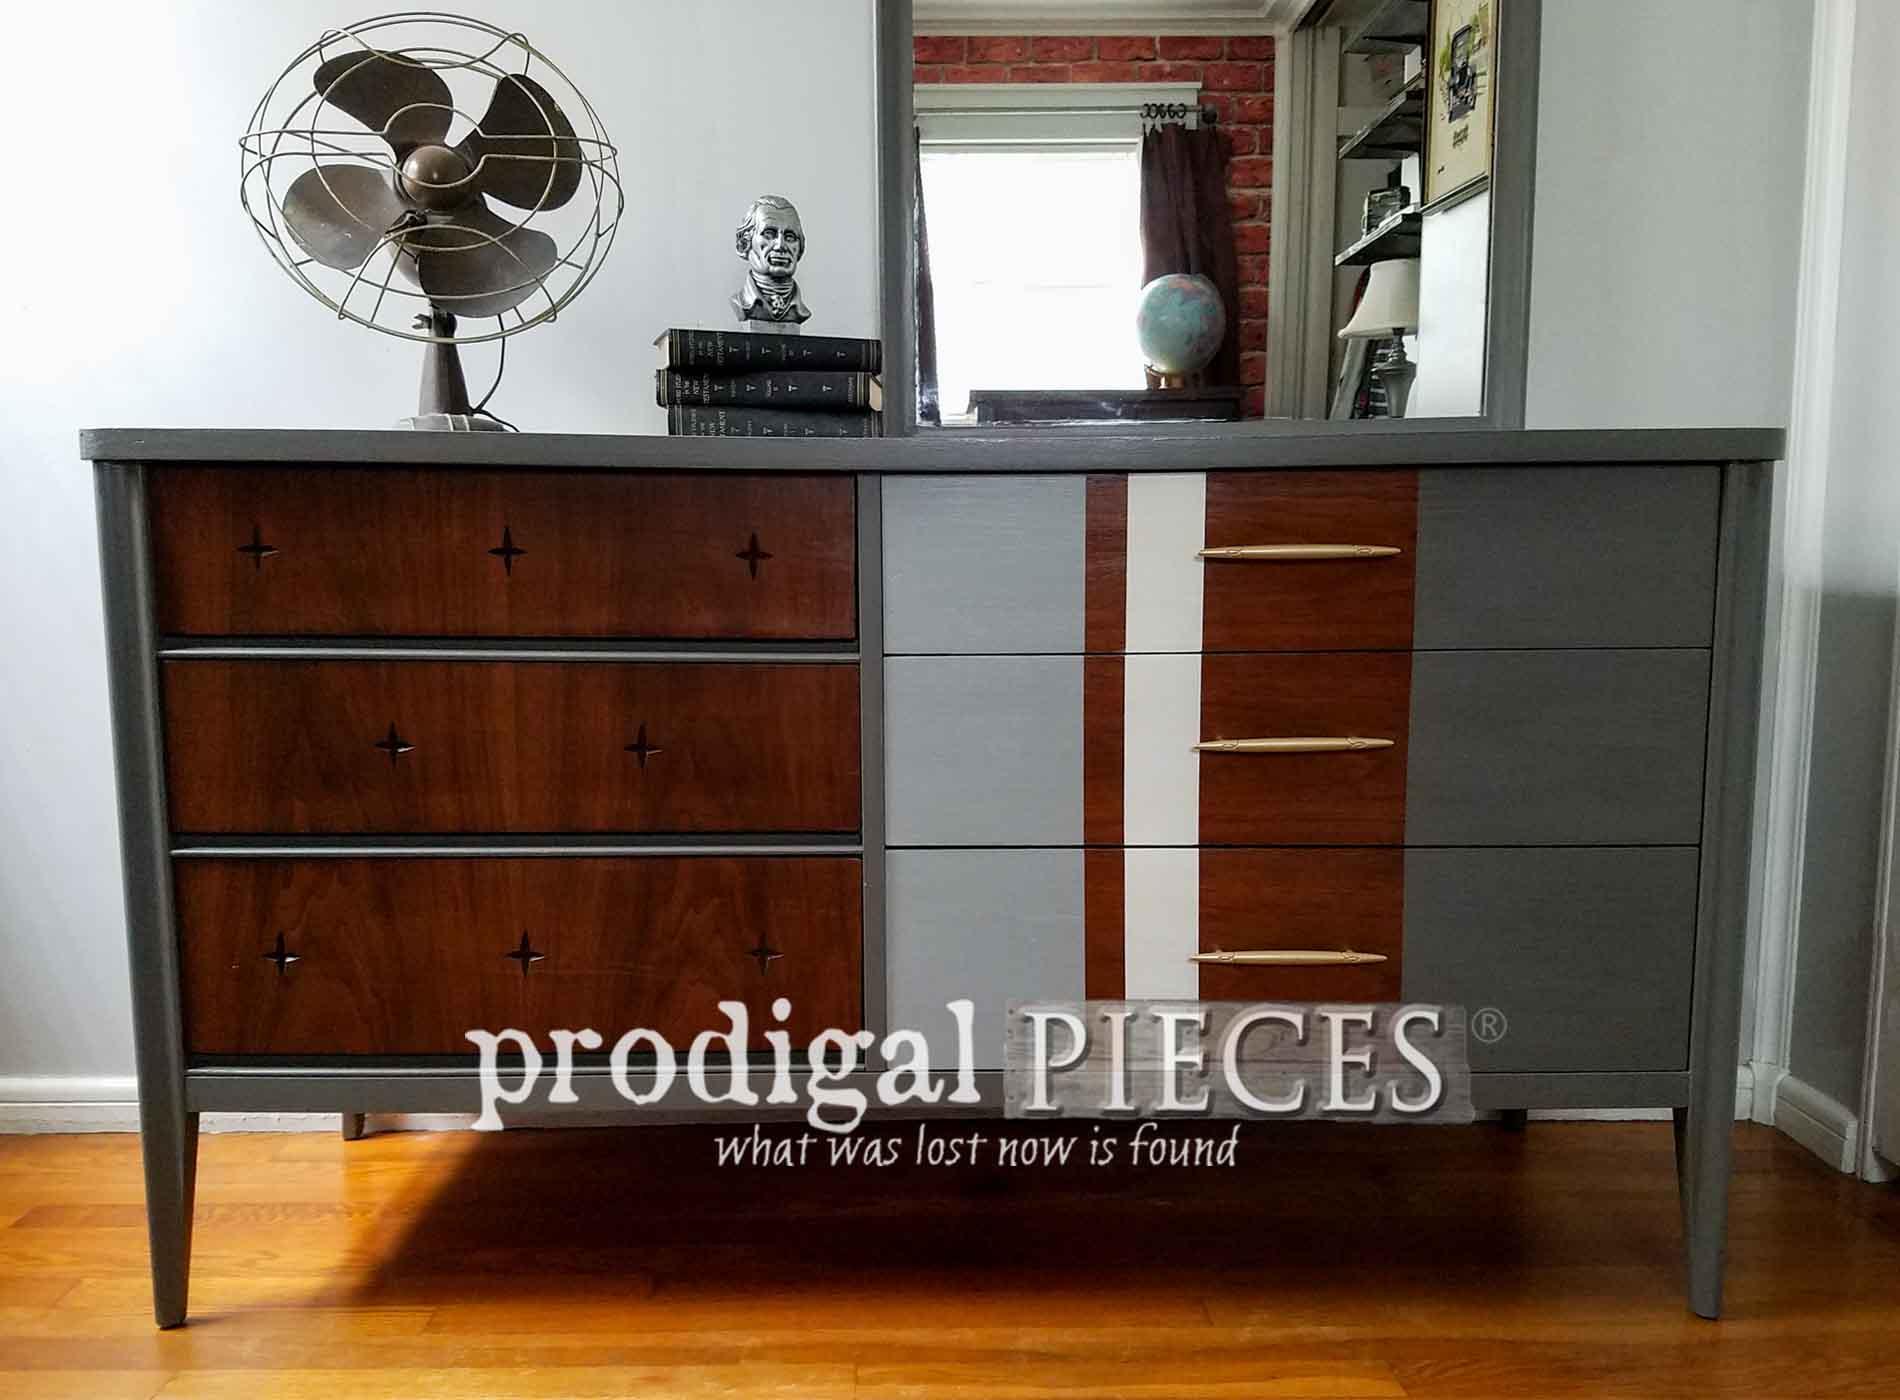 Featured Vintage Broyhill Saga Dresser by Prodigal Pieces | prodigalpieces.com